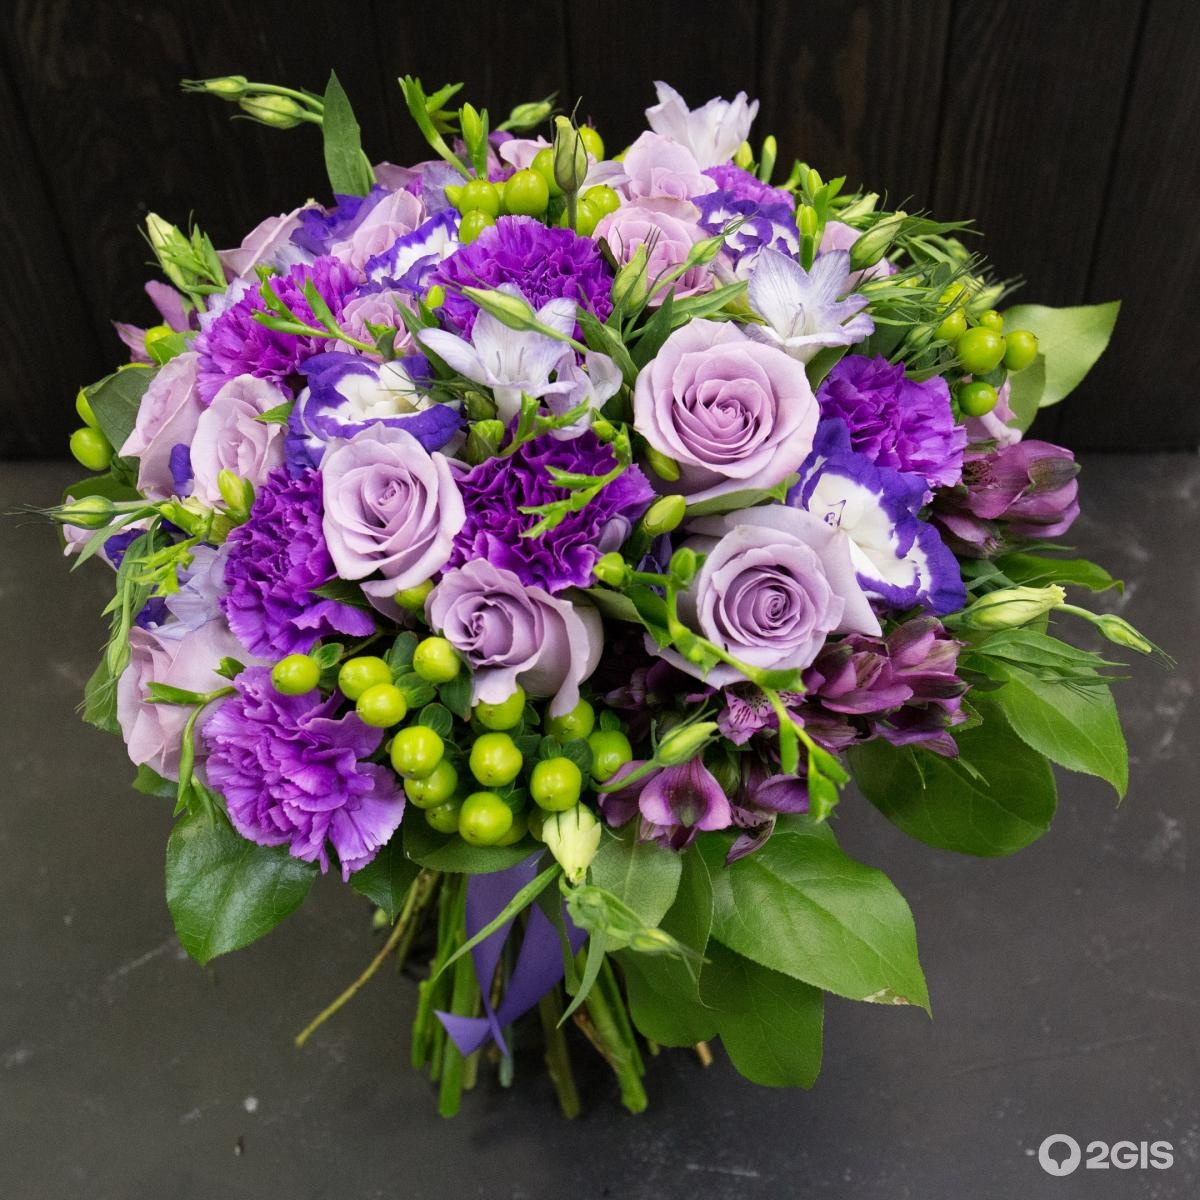 Букет казань официальный сайт, цветы саду даче